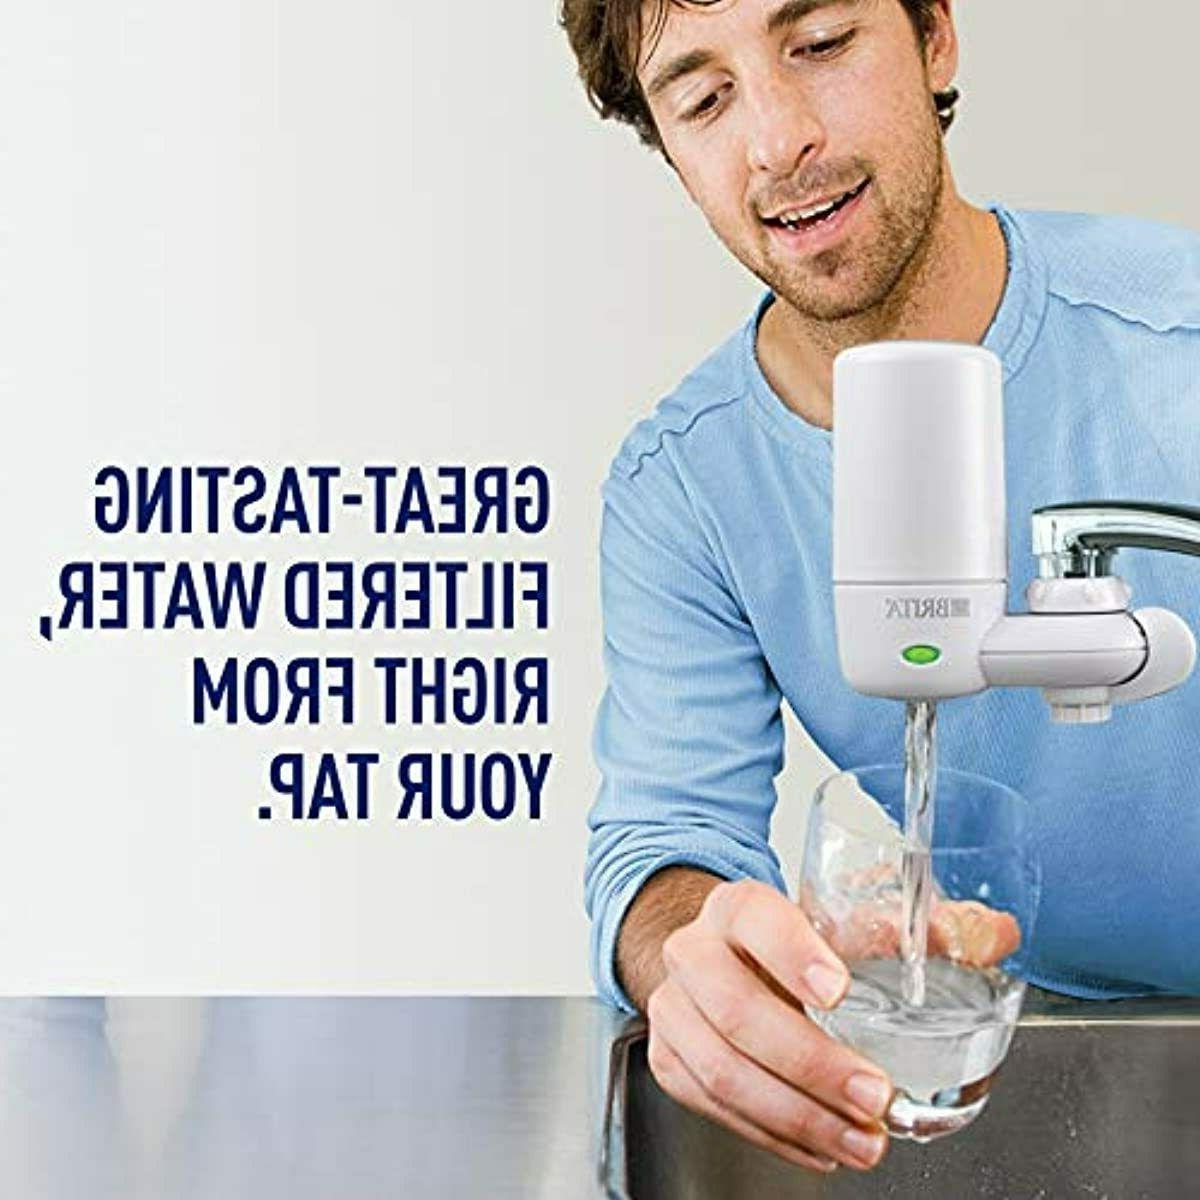 Brita Purifier Water Tap Filters